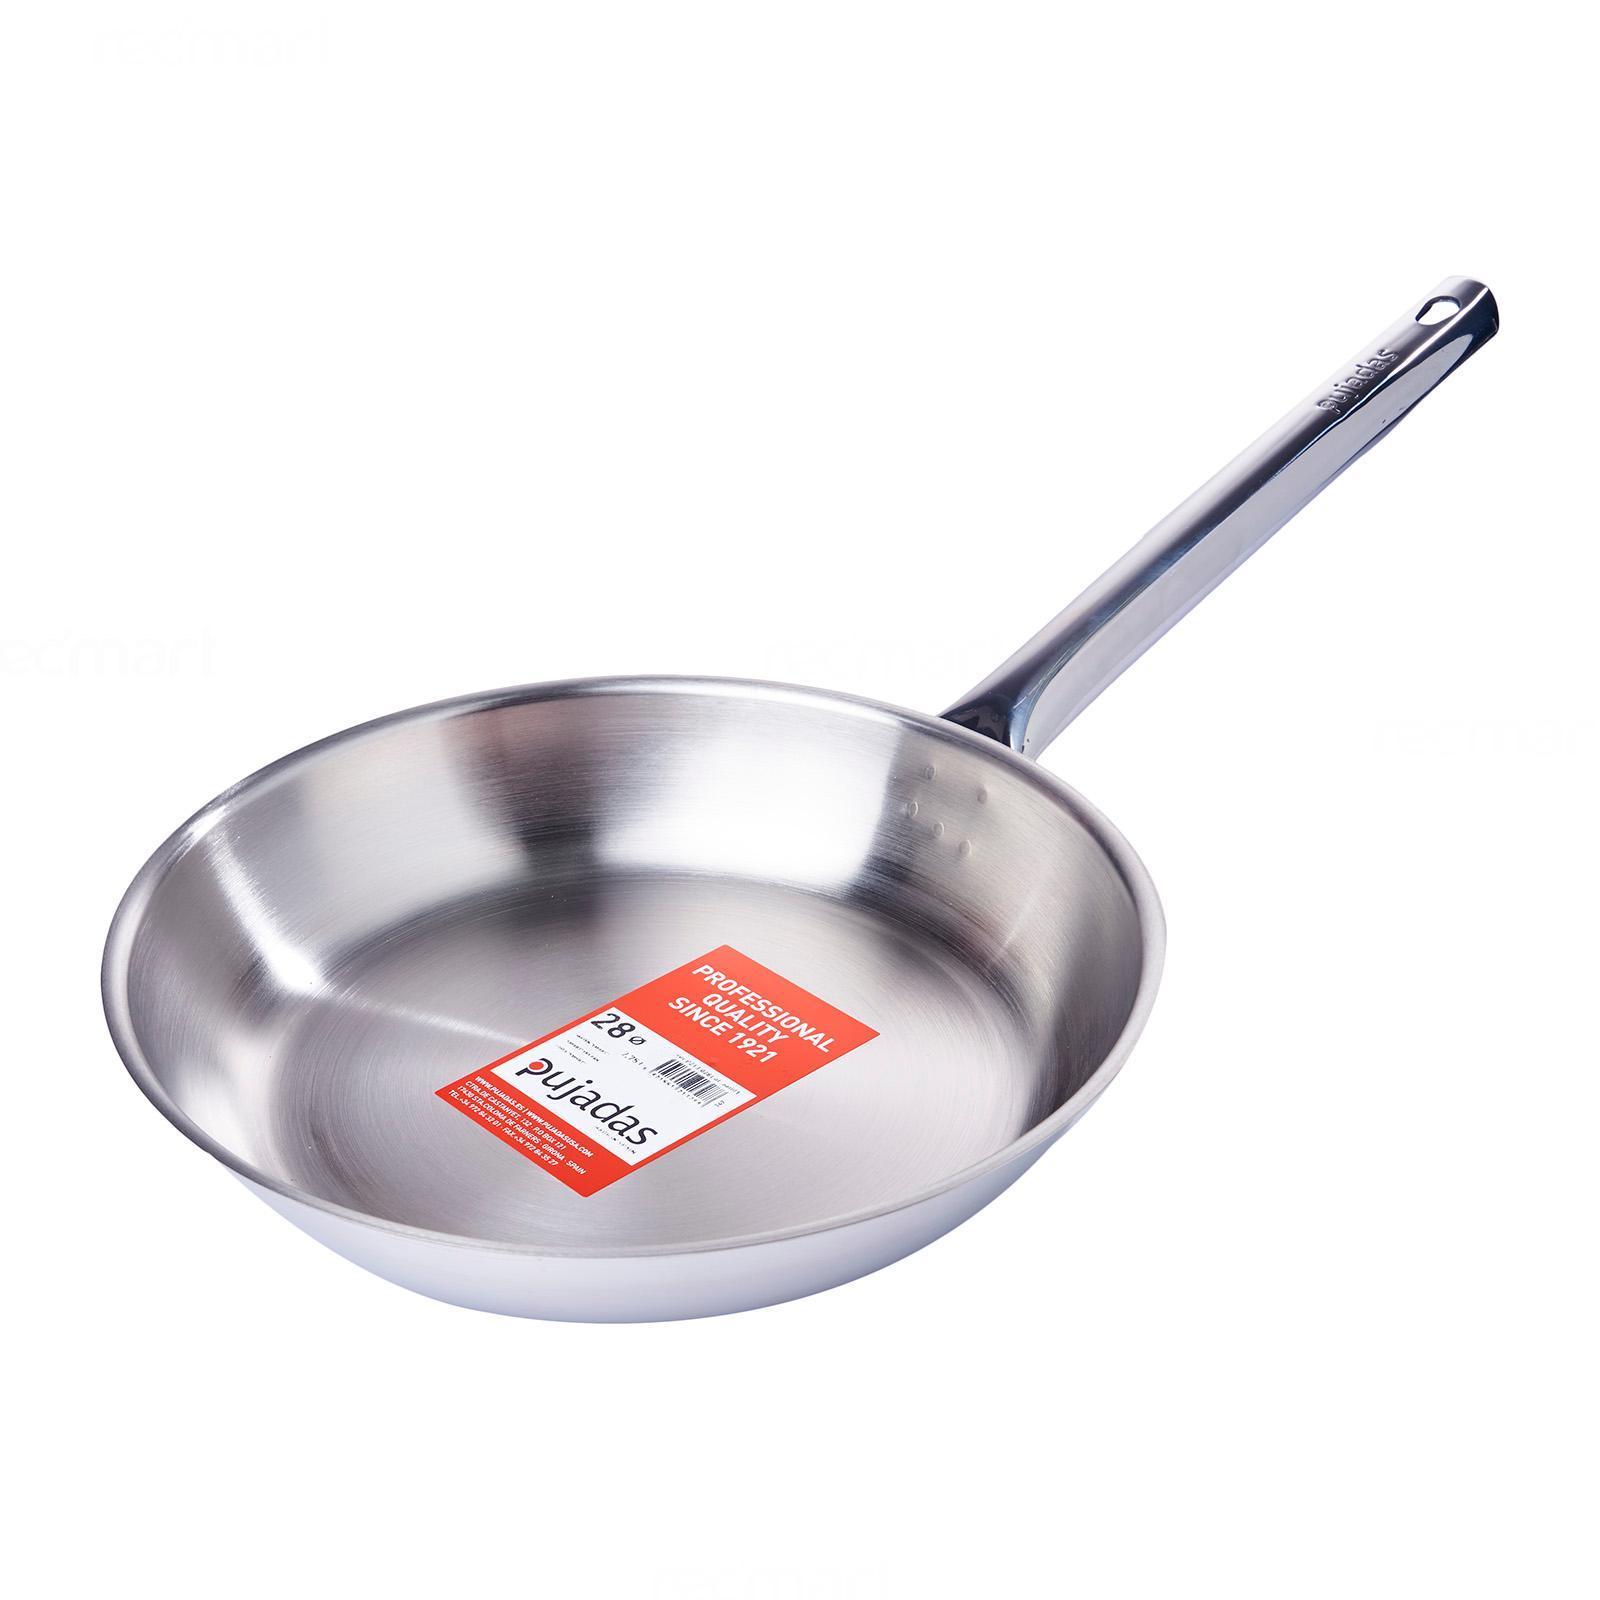 Pujadas Stainless Steel Fry Pan 28Cm